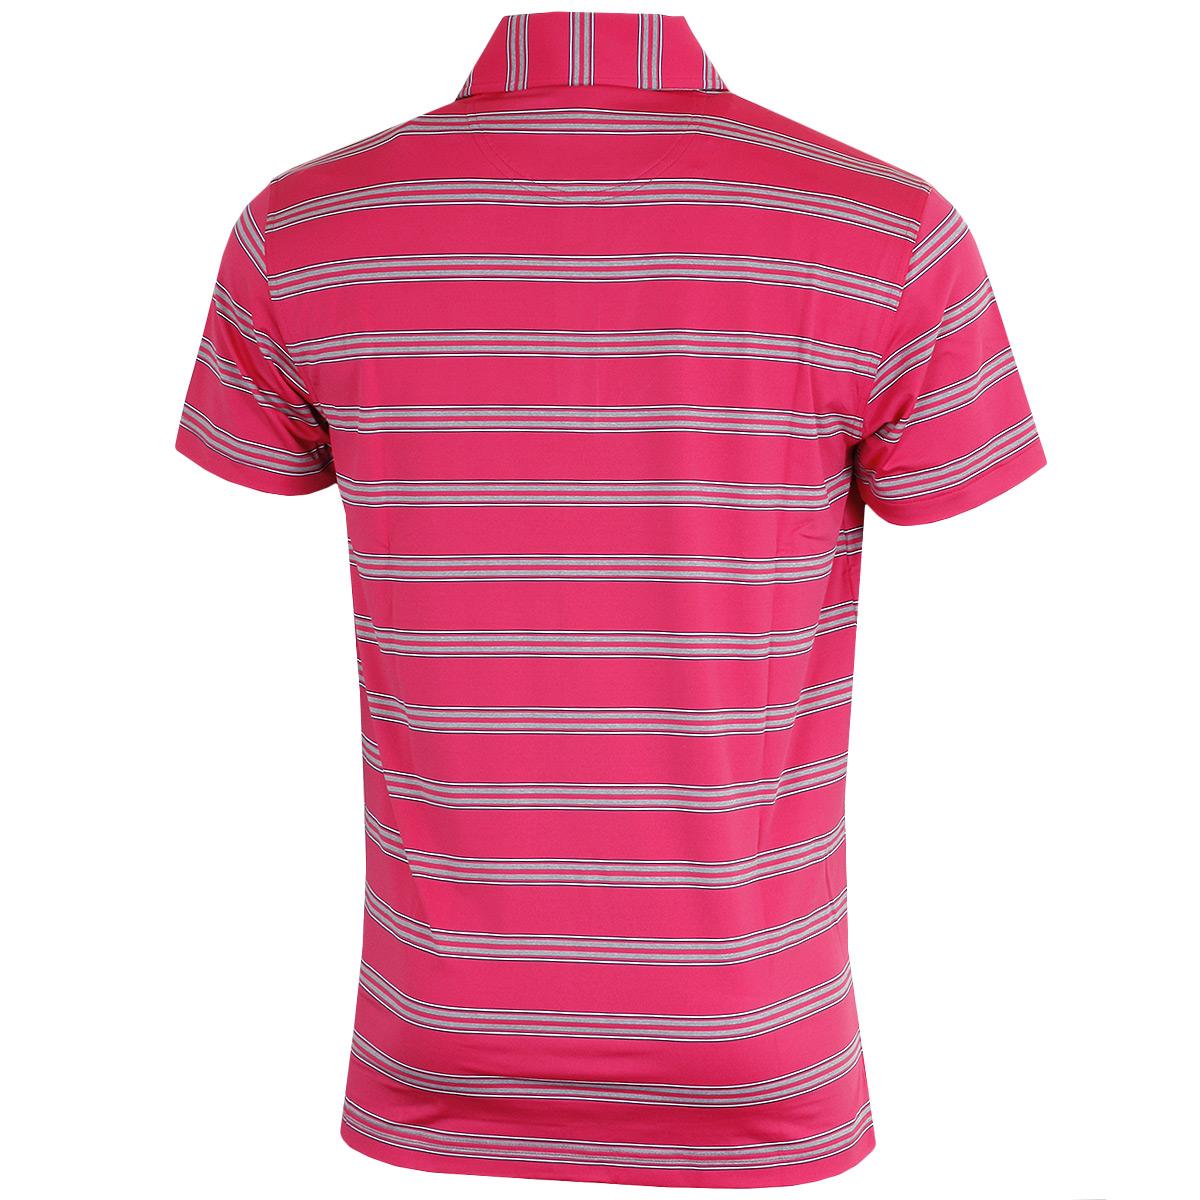 Bobby-Jones-Mens-XH20-Wren-Heather-Stripe-Stretch-Golf-Polo-Shirt-72-OFF-RRP thumbnail 5